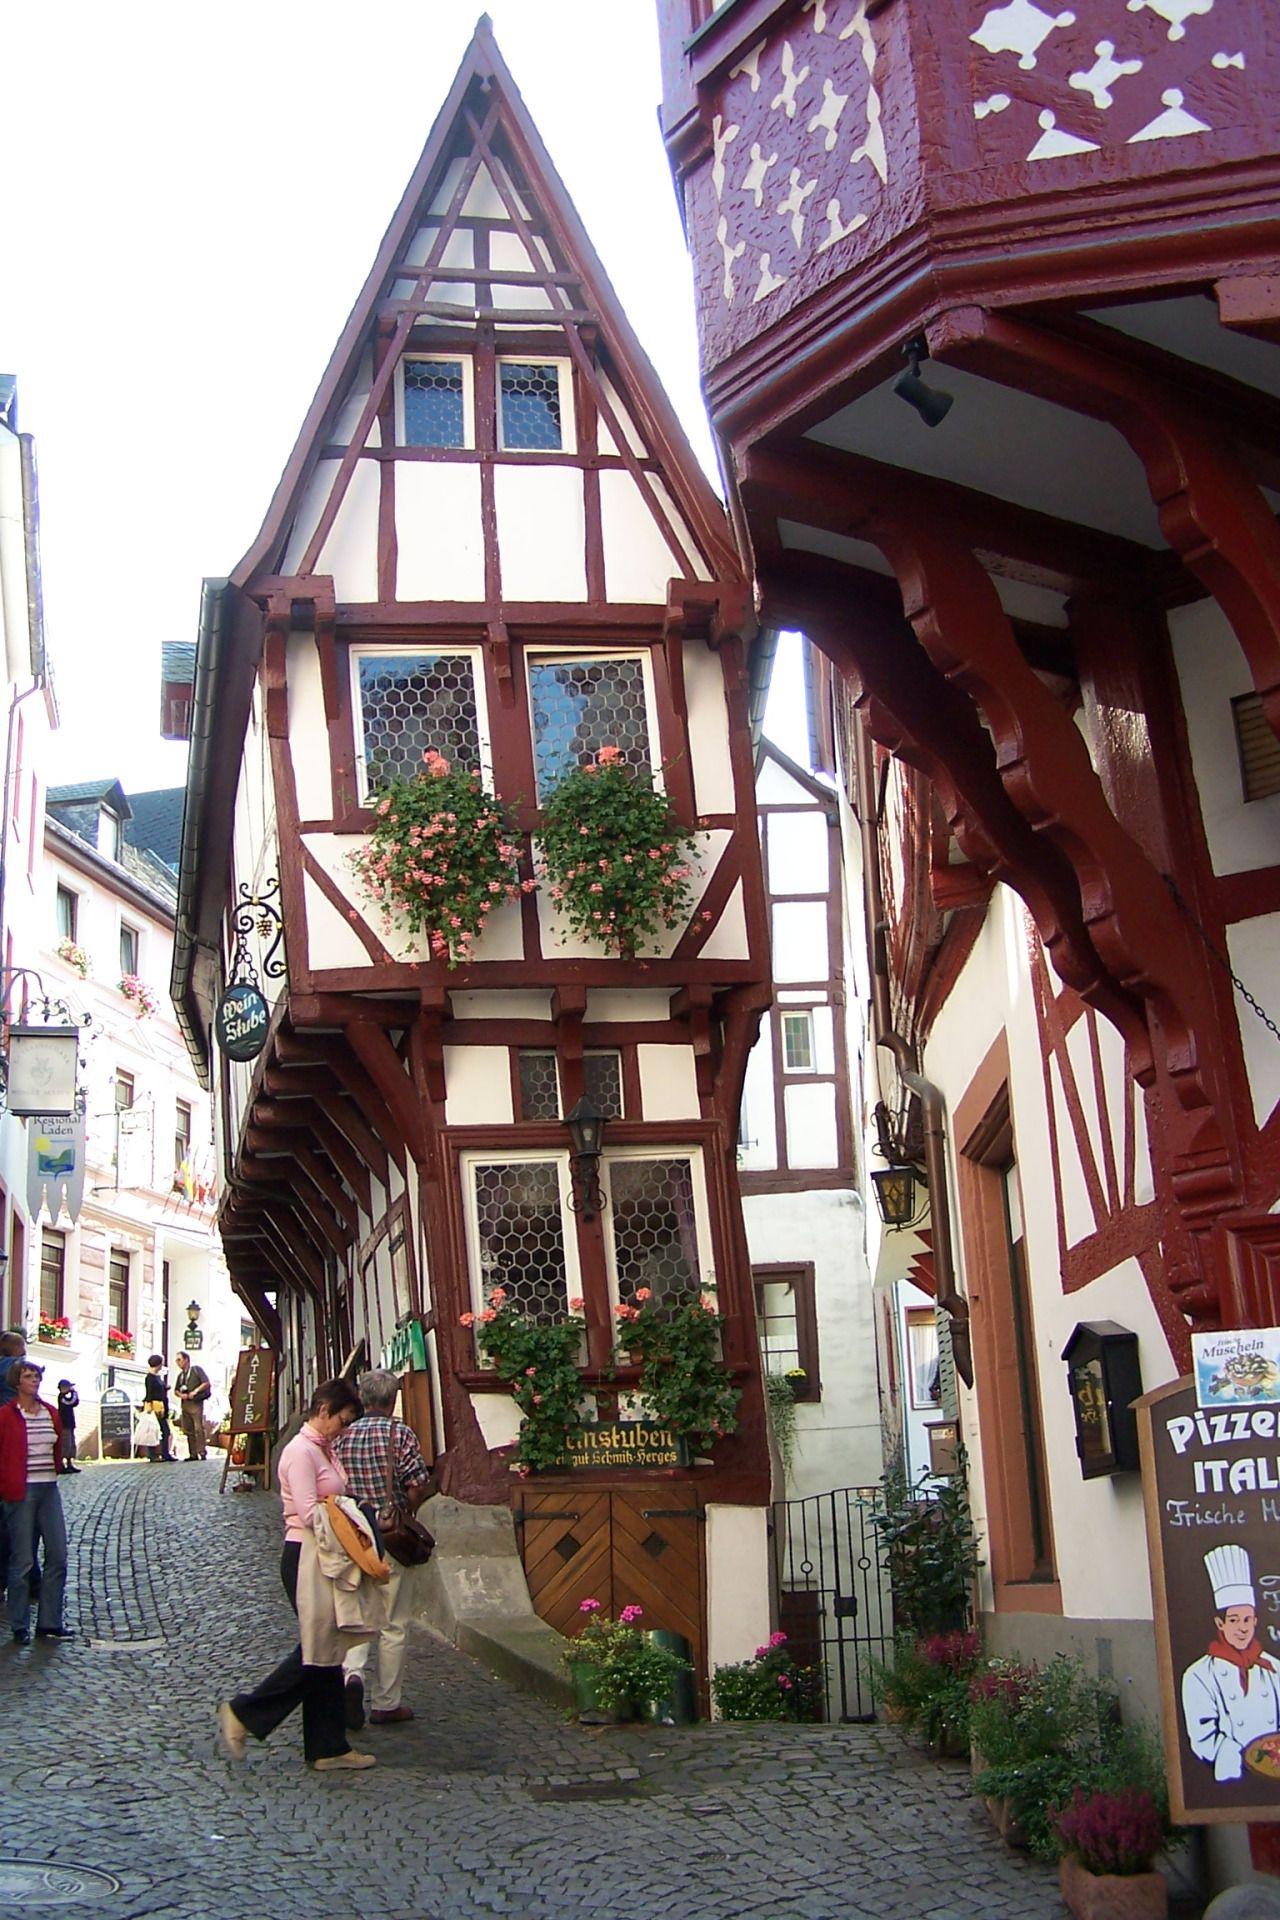 bernkastel kues rheinland pfalz southwestern germany travel pinterest deutschland. Black Bedroom Furniture Sets. Home Design Ideas